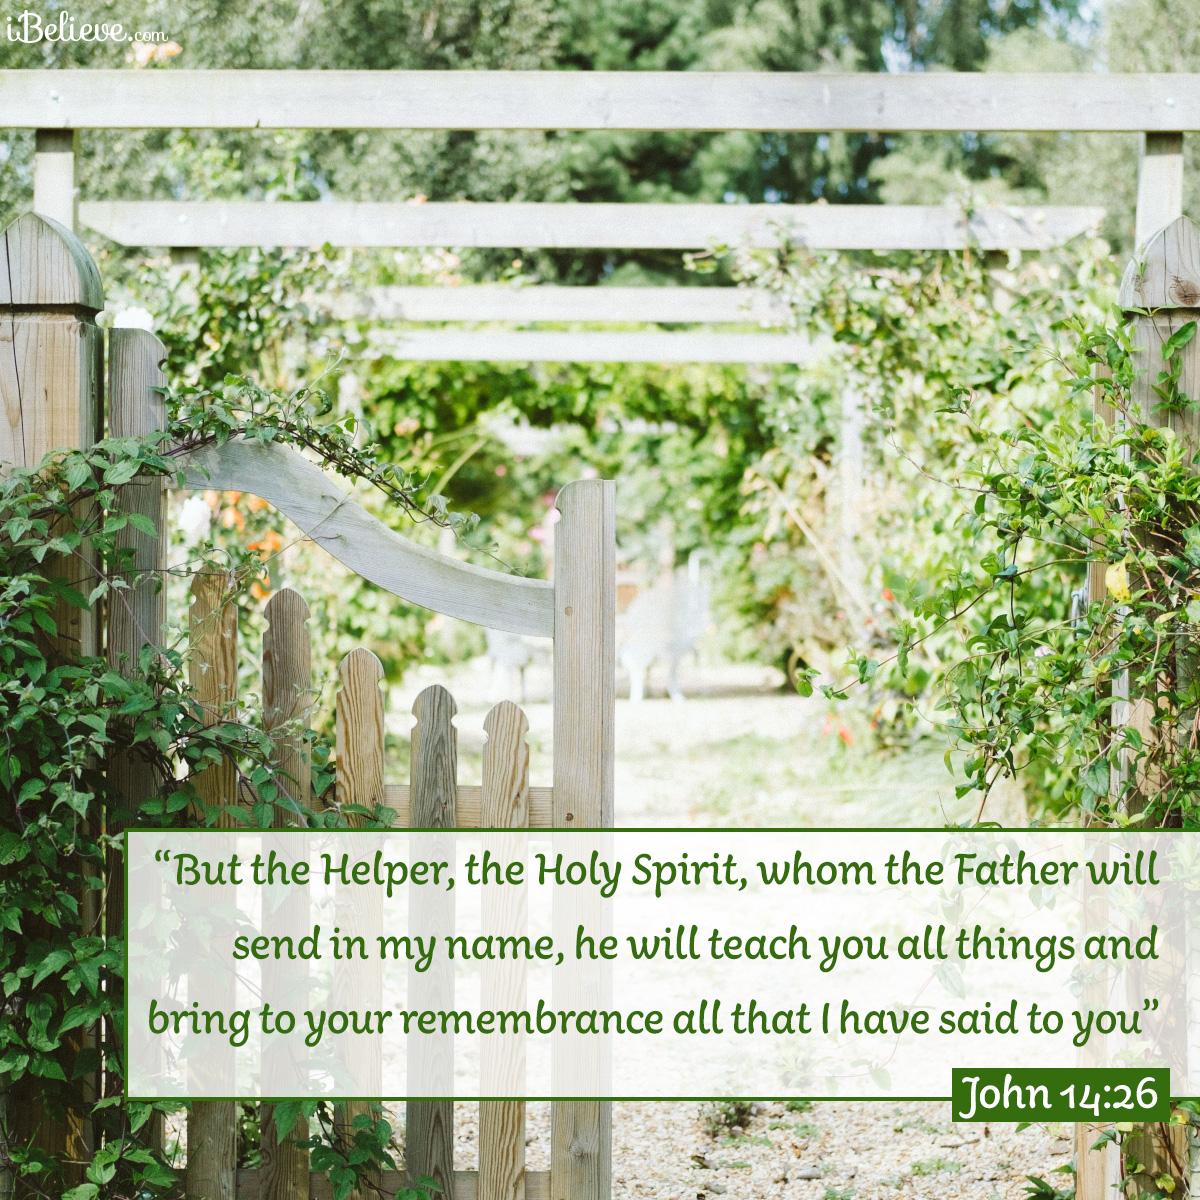 John 14:26, inspirational image